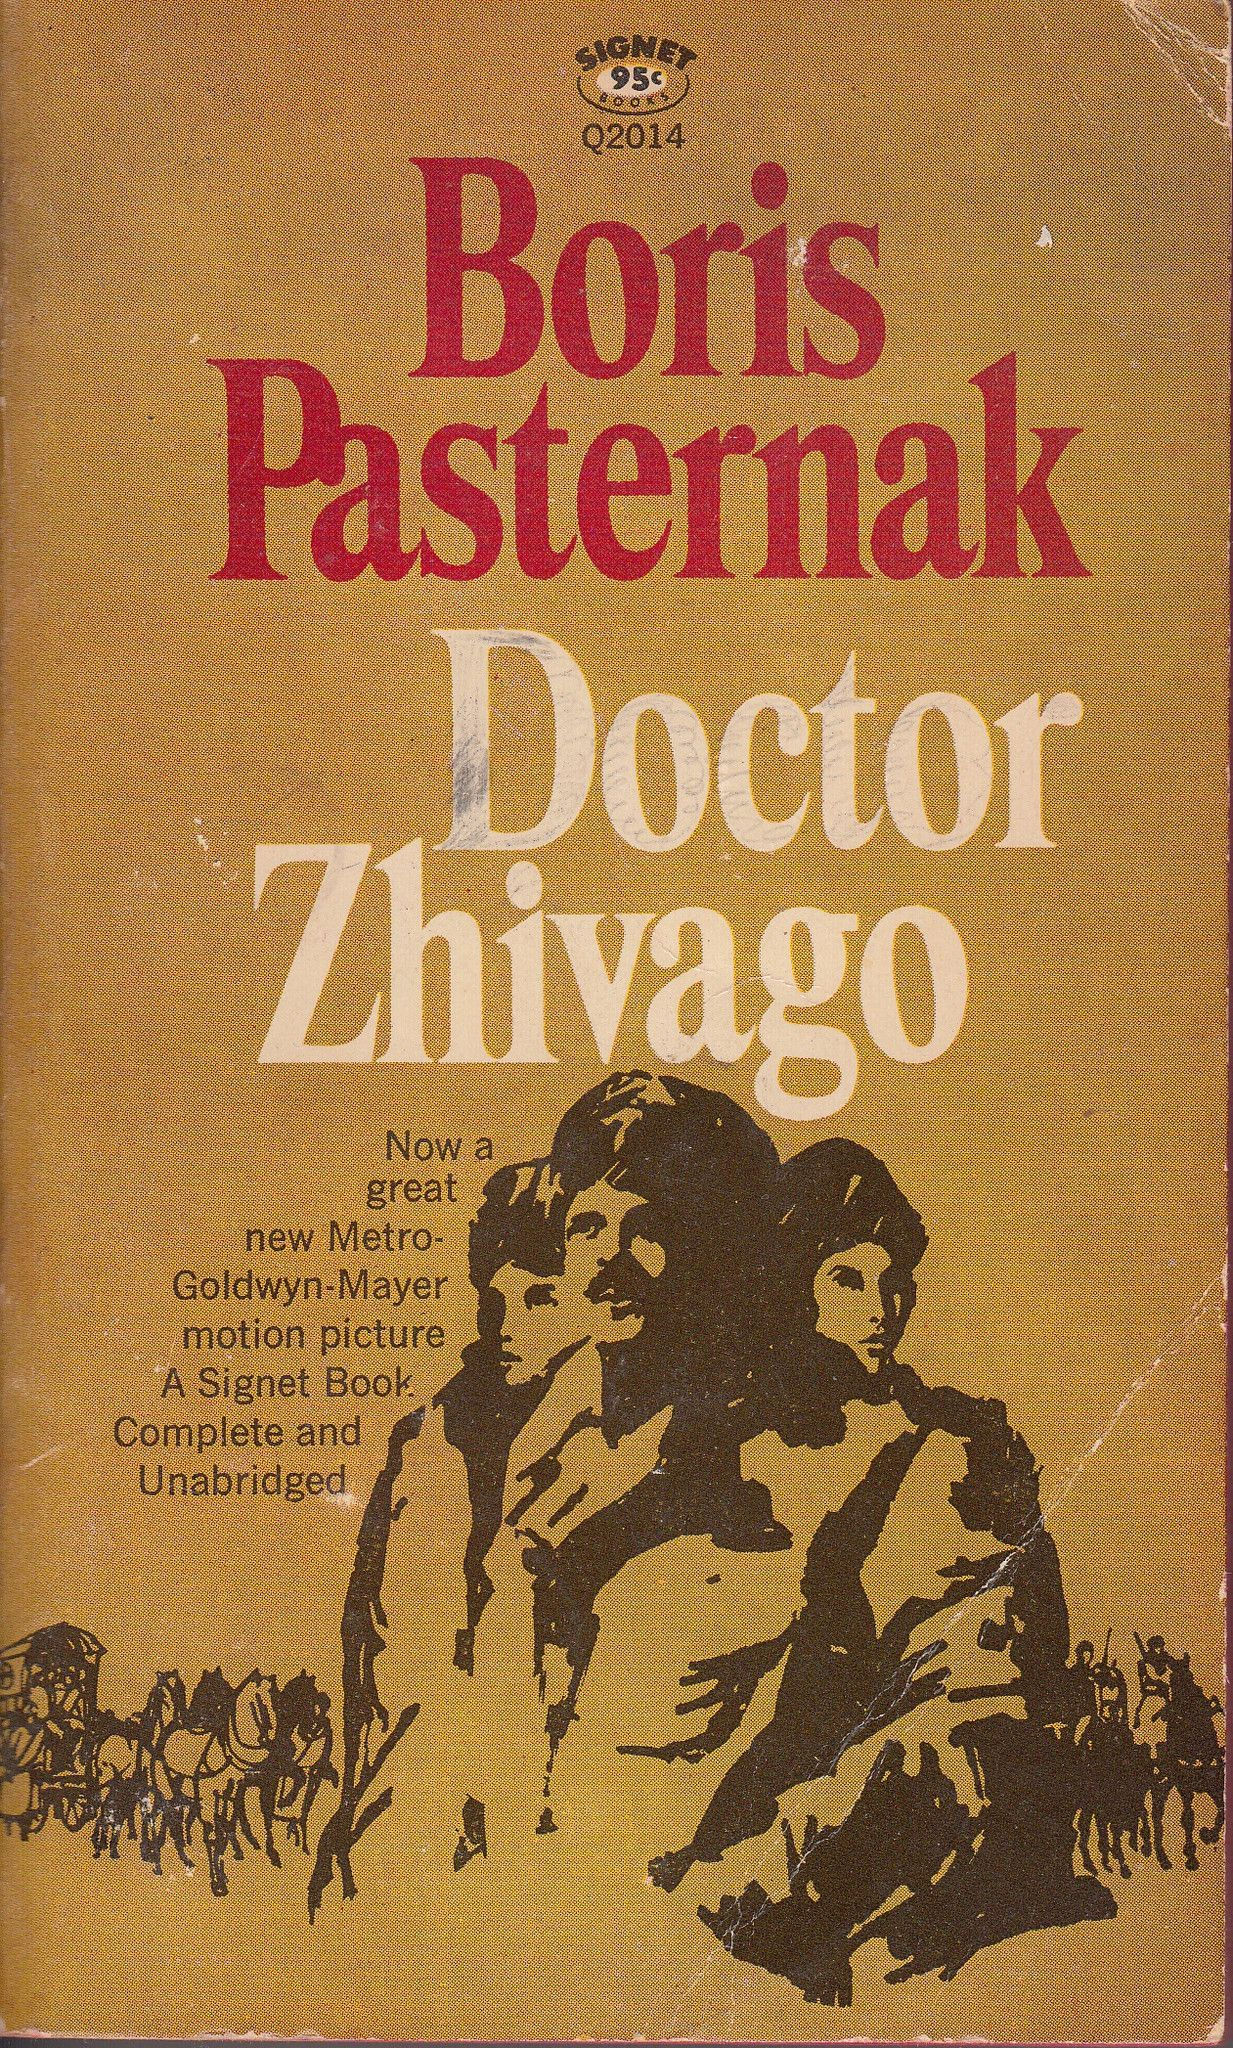 Doctor Zhivago | Dr zhivago, Doctor zhivago book, Romantic books